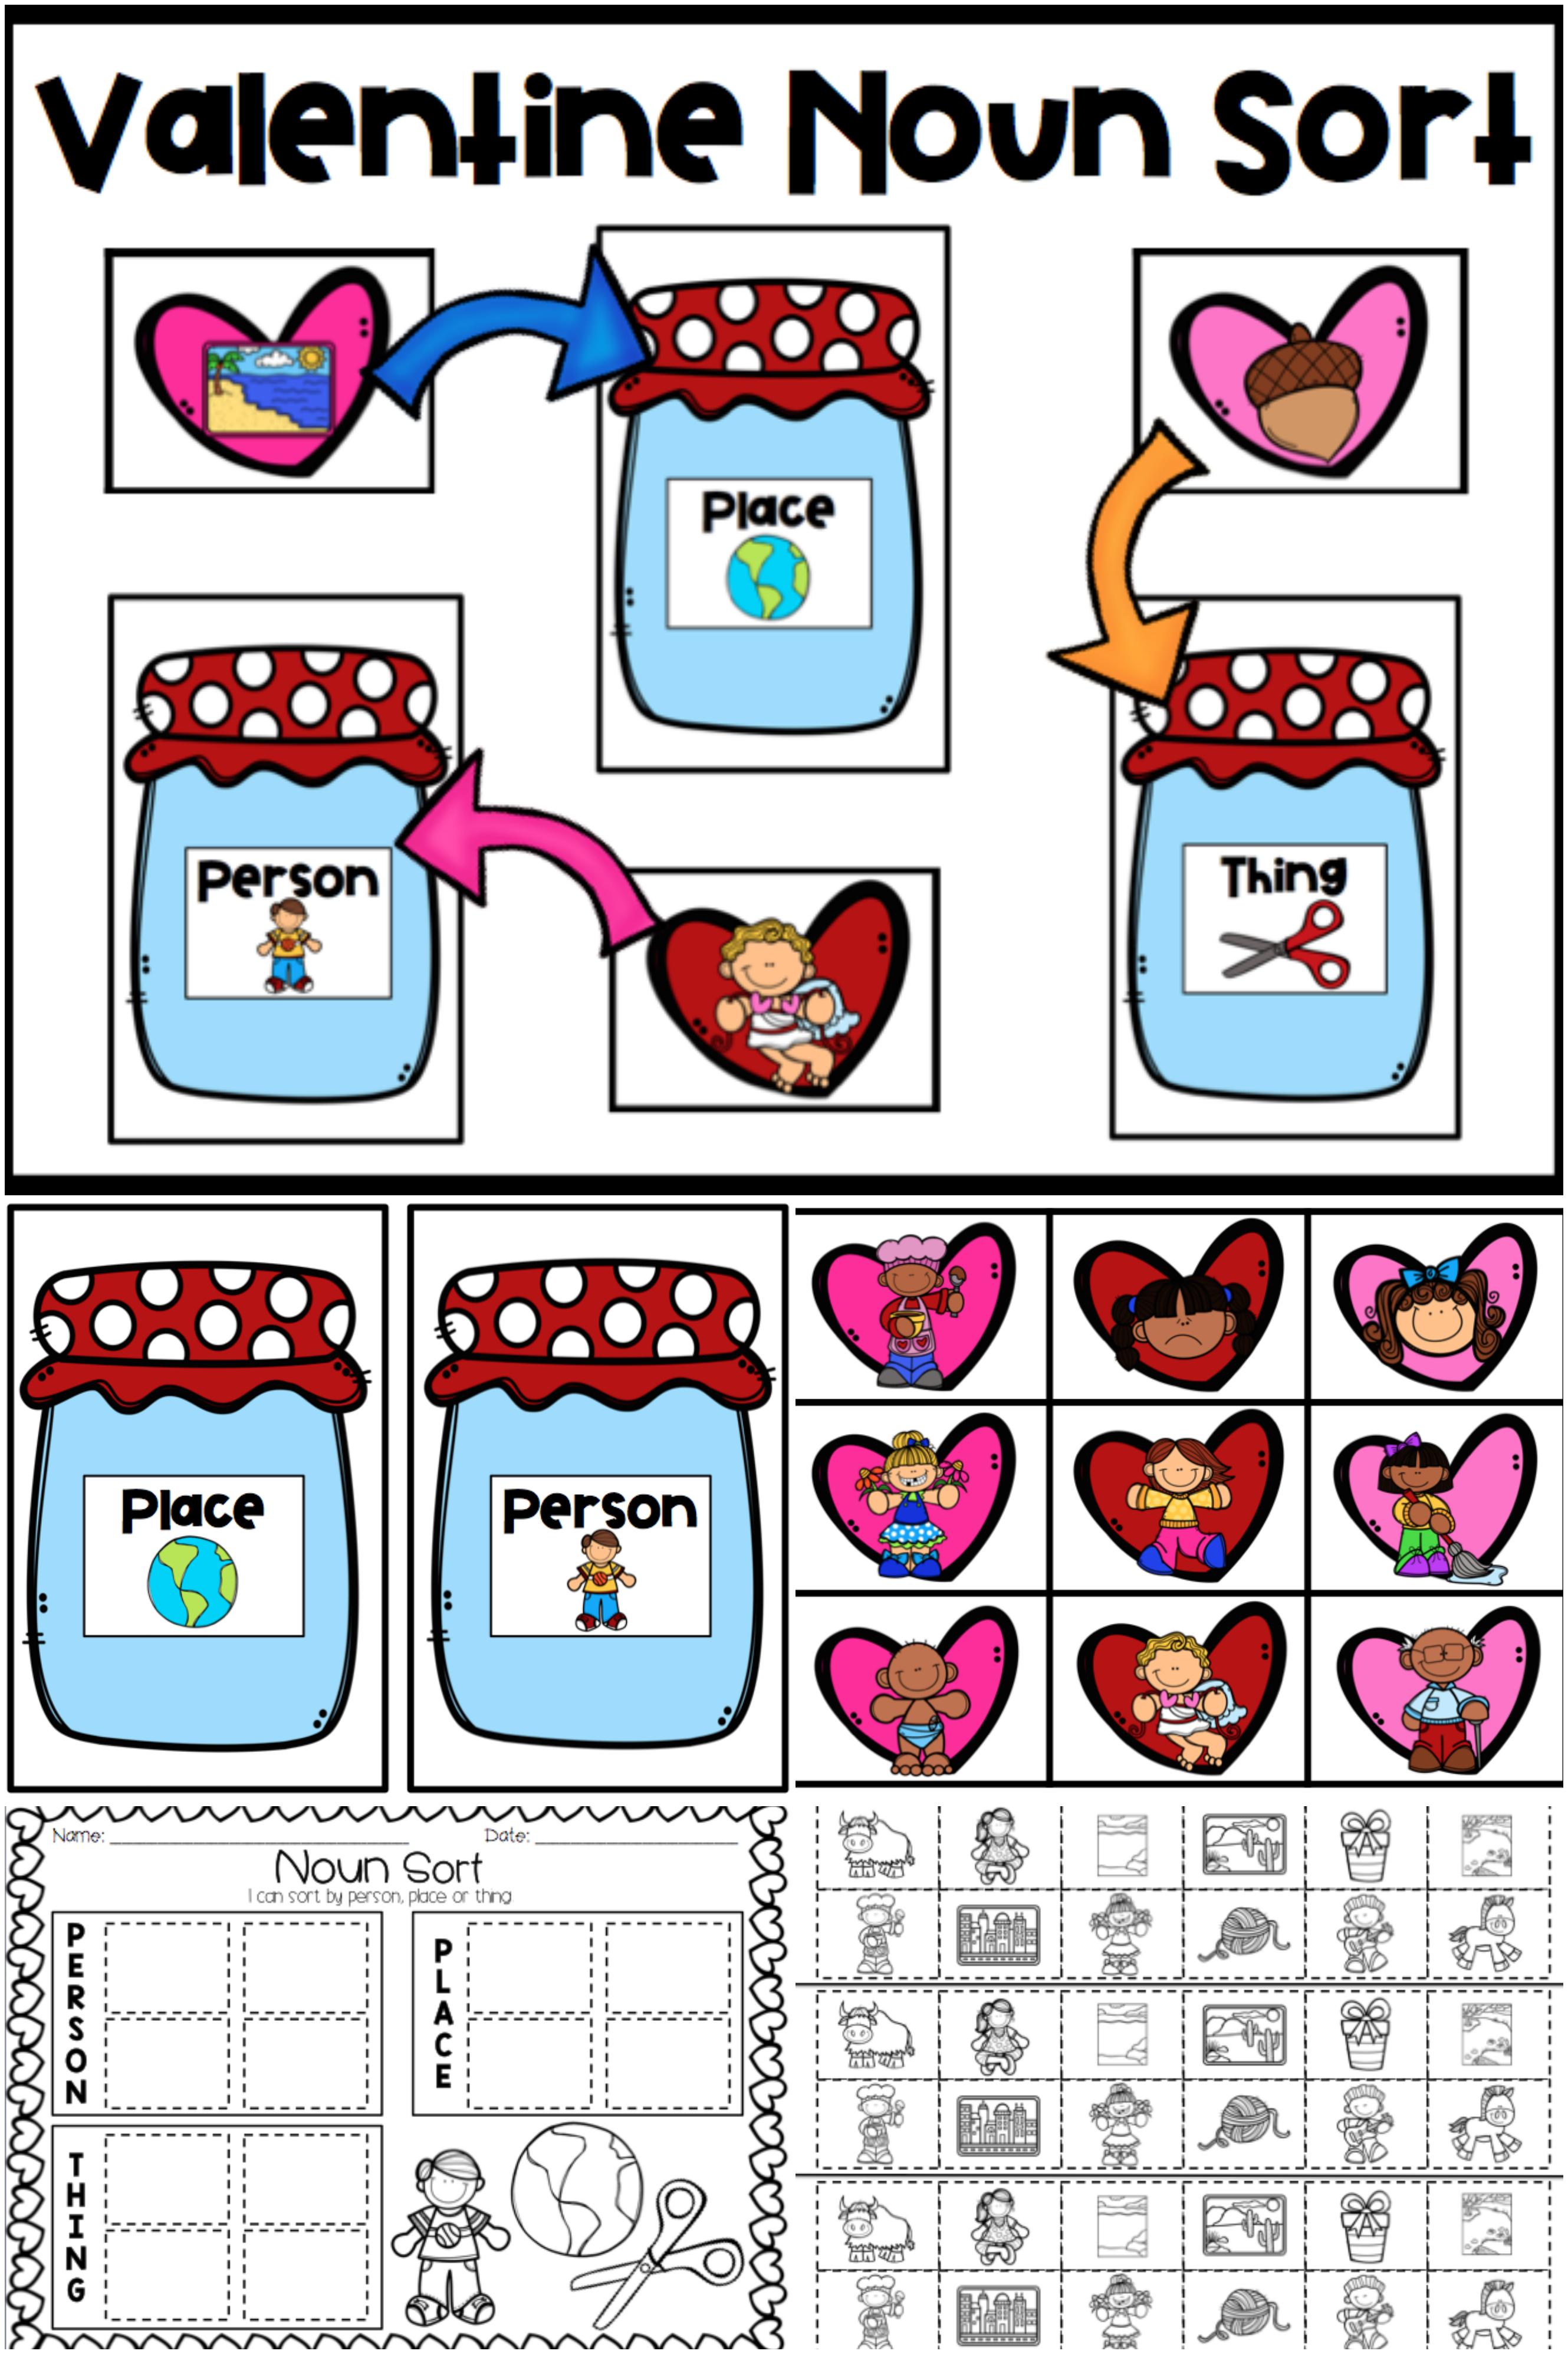 Valentine Noun Sort With Images